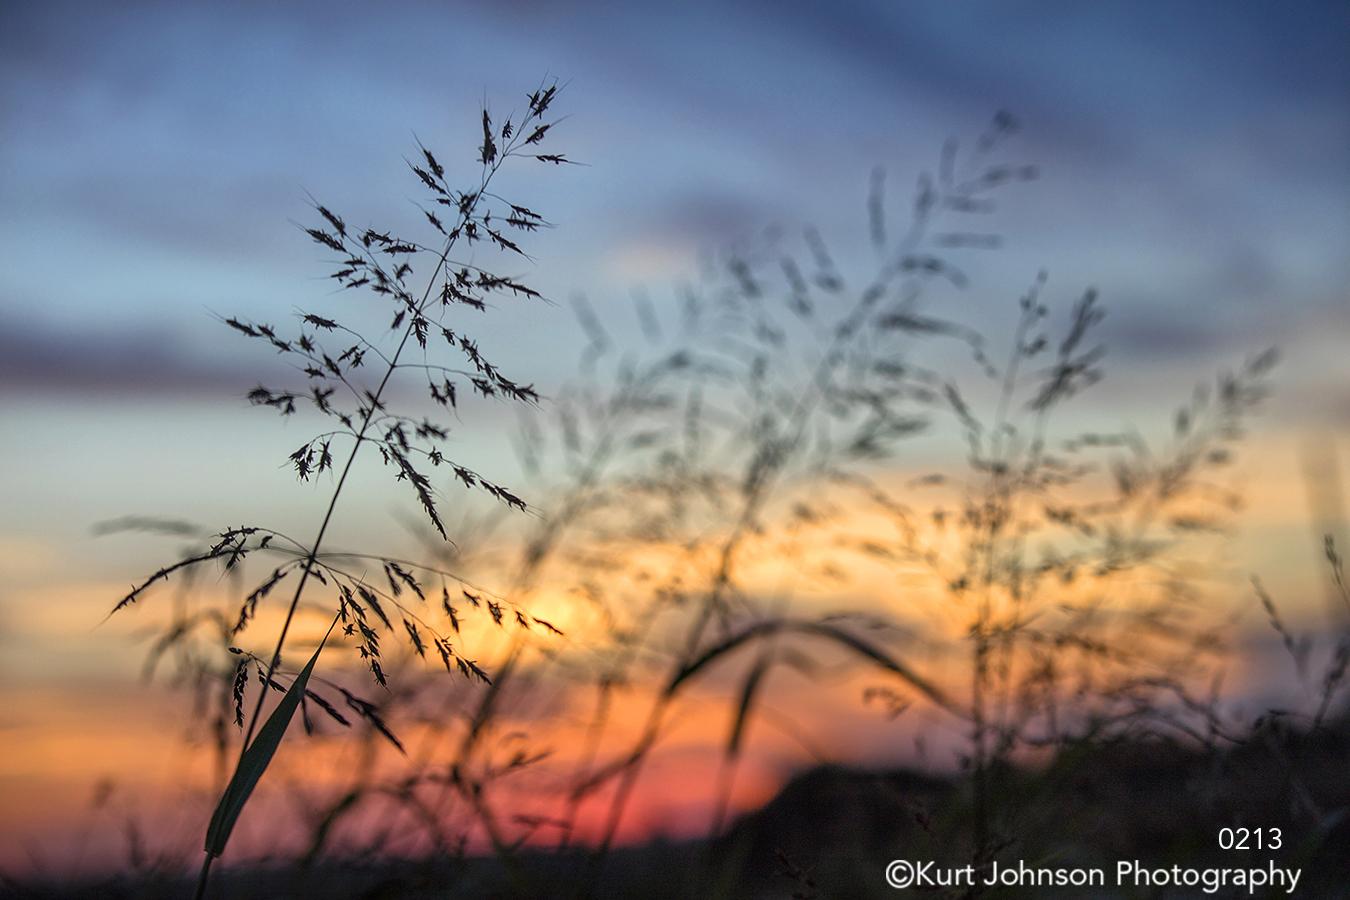 tall grass grasses sunset purple pink sky wheat field midwest